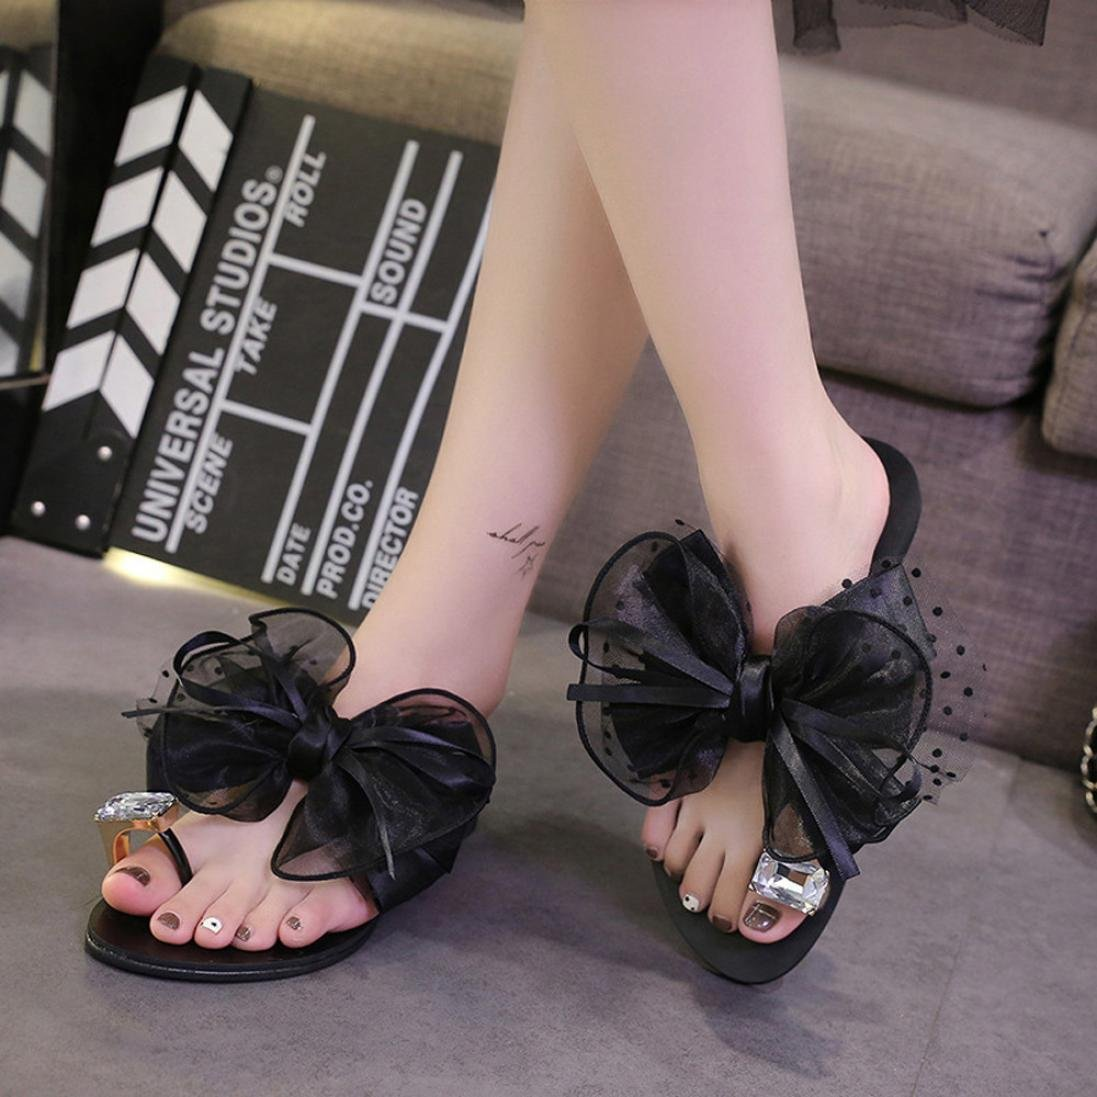 Estivi Sandali Donna,Witsaye Donna,Witsaye Sandali Eleganti Donna Pantofole Scarpe Papillon Fiori Ciabatte Pantofole da Spiaggia Ragazze Infradito Nero f21b59